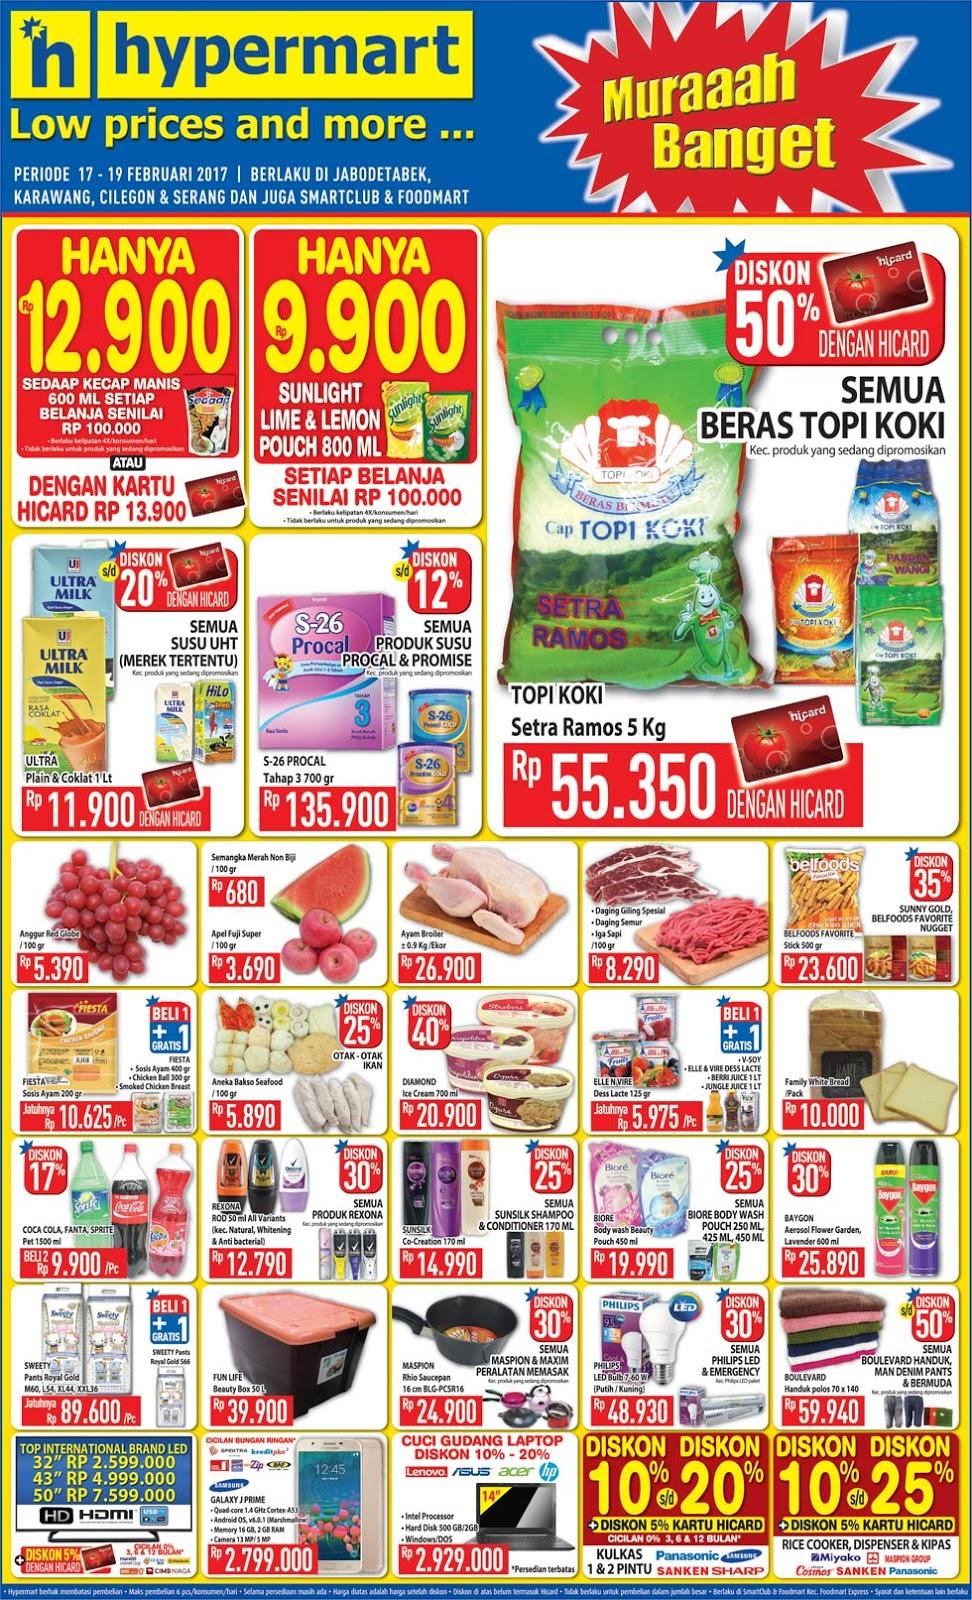 Aneka Promo Februari 2017 Voucher Belanja Hypermart Oke Supaya Tidaklah Terlalu Menanti Lebih Lama Lagi Segera Saja Kita Simak Product Apa Sajakah Yang Masuk Dalam Daftar Katalog Harga